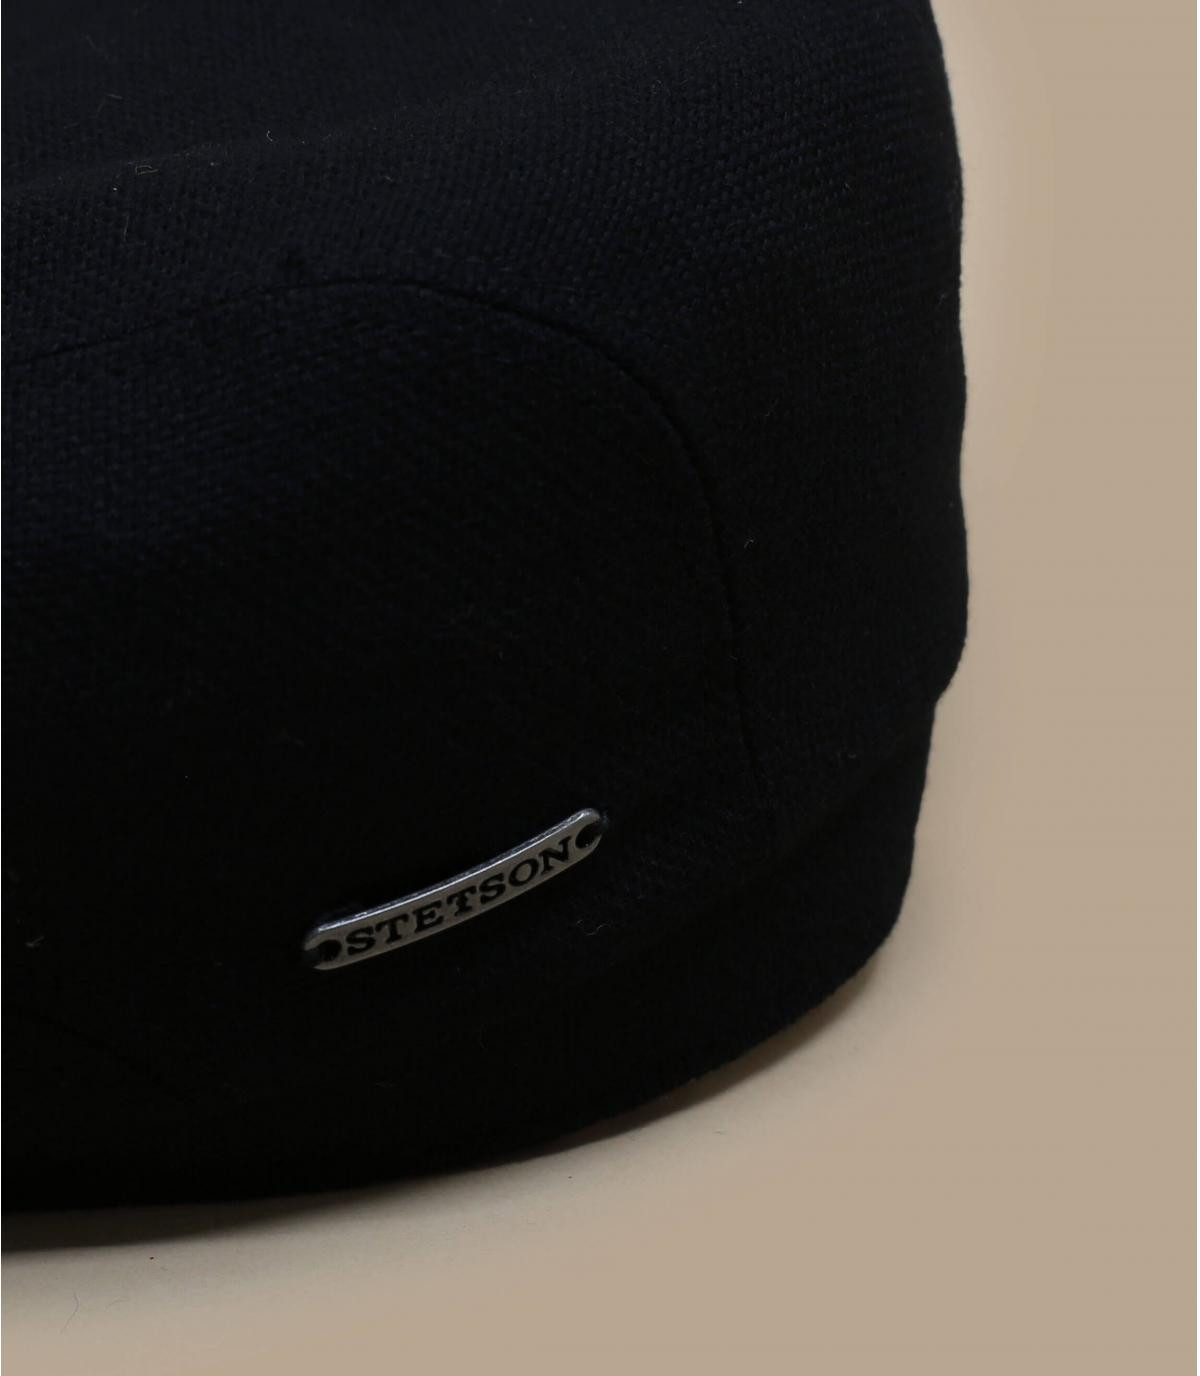 Détails Belfast virgin wool cashmere black - image 2